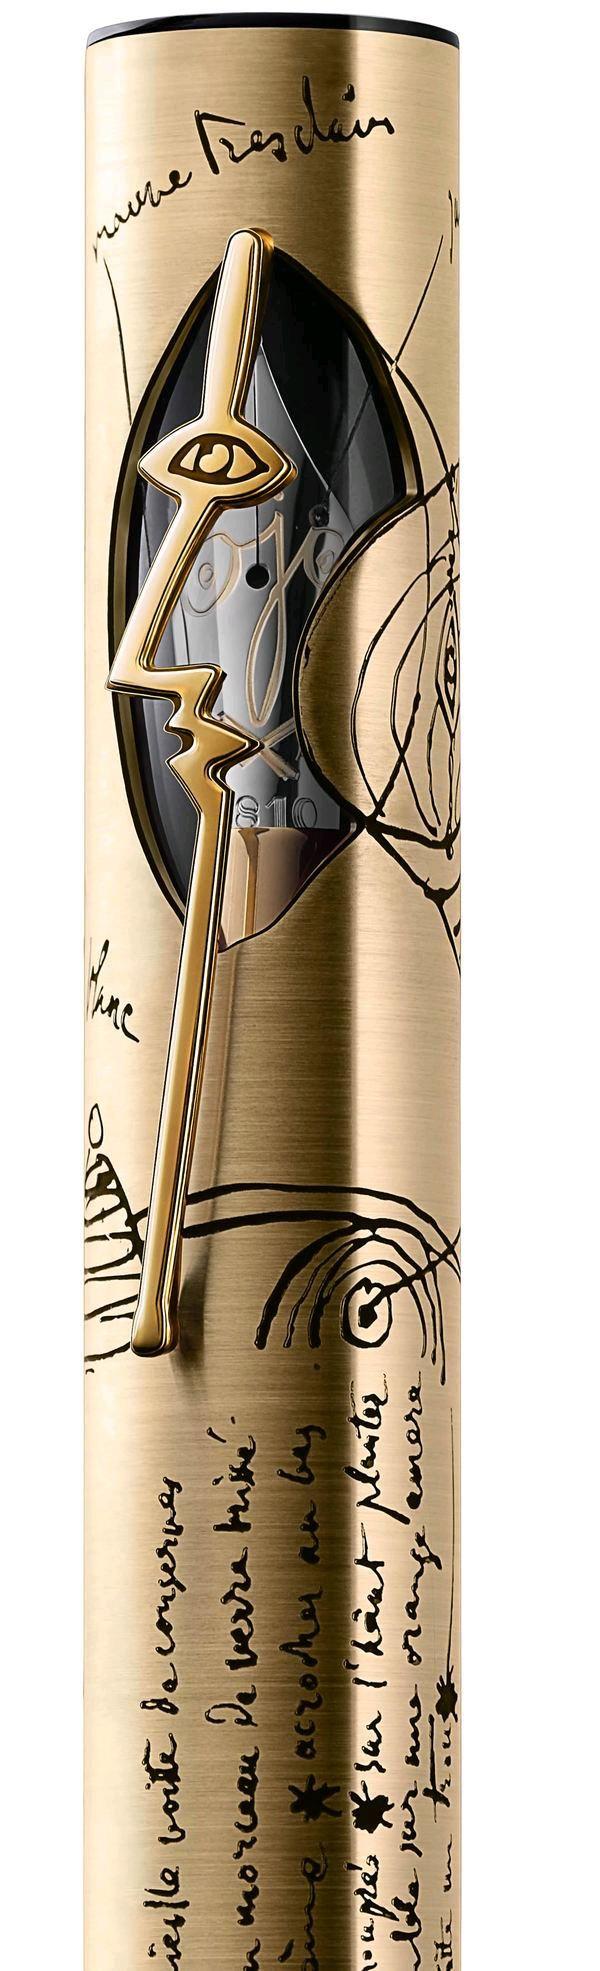 Montblanc Pablo Picasso Fountain Pen